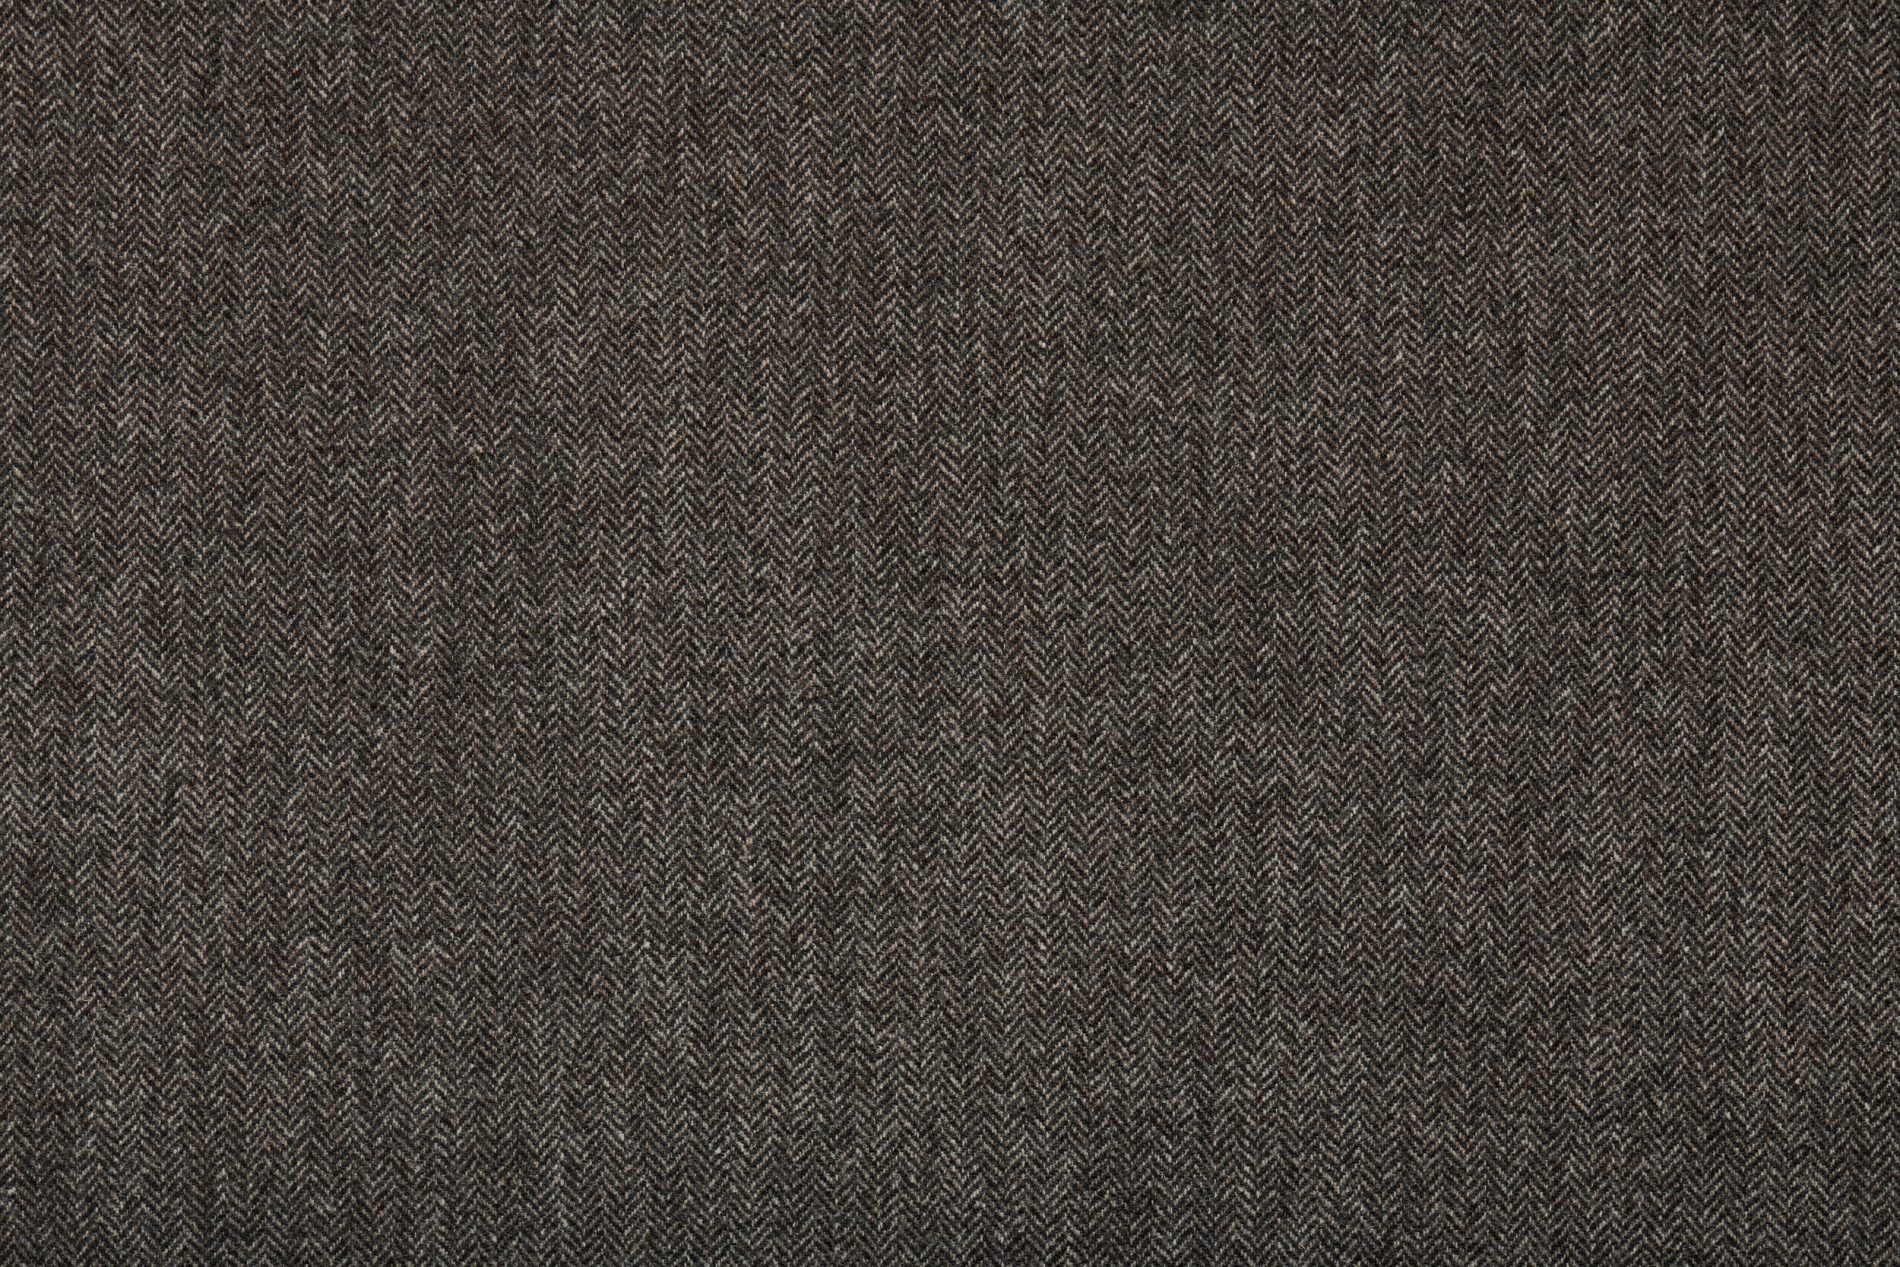 FANCY 360 Herringbone (50/5024-5026)